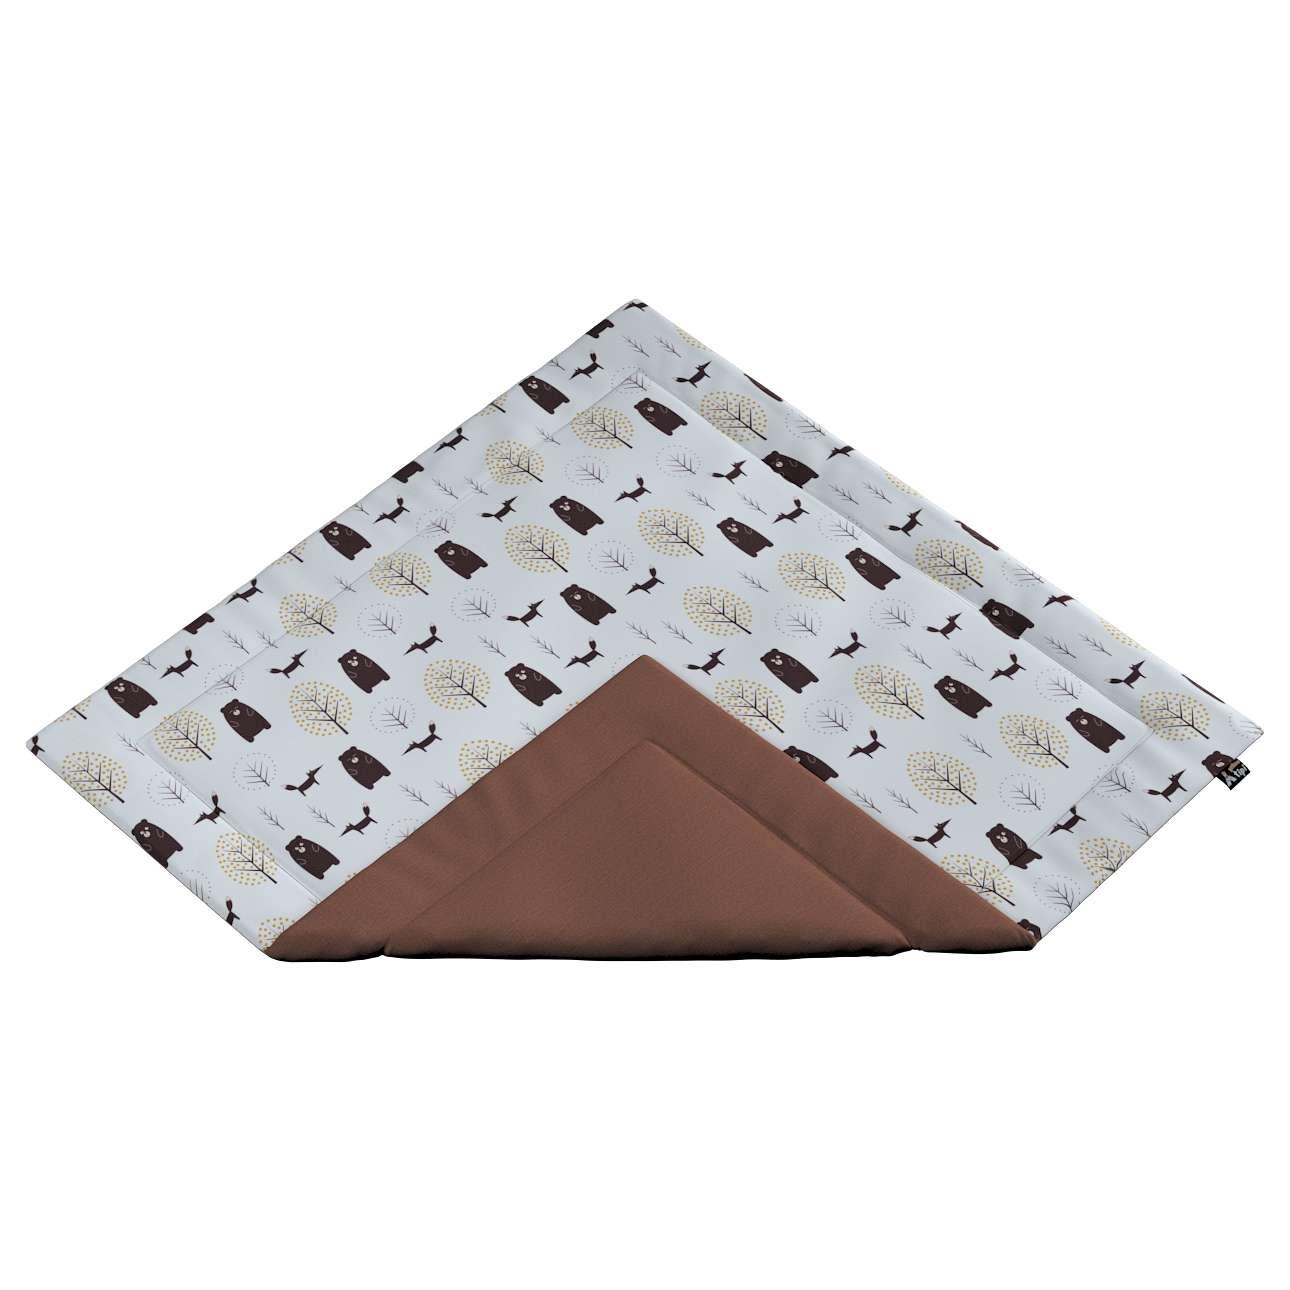 Tepee kilimėlis kolekcijoje Magic Collection, audinys: 500-19